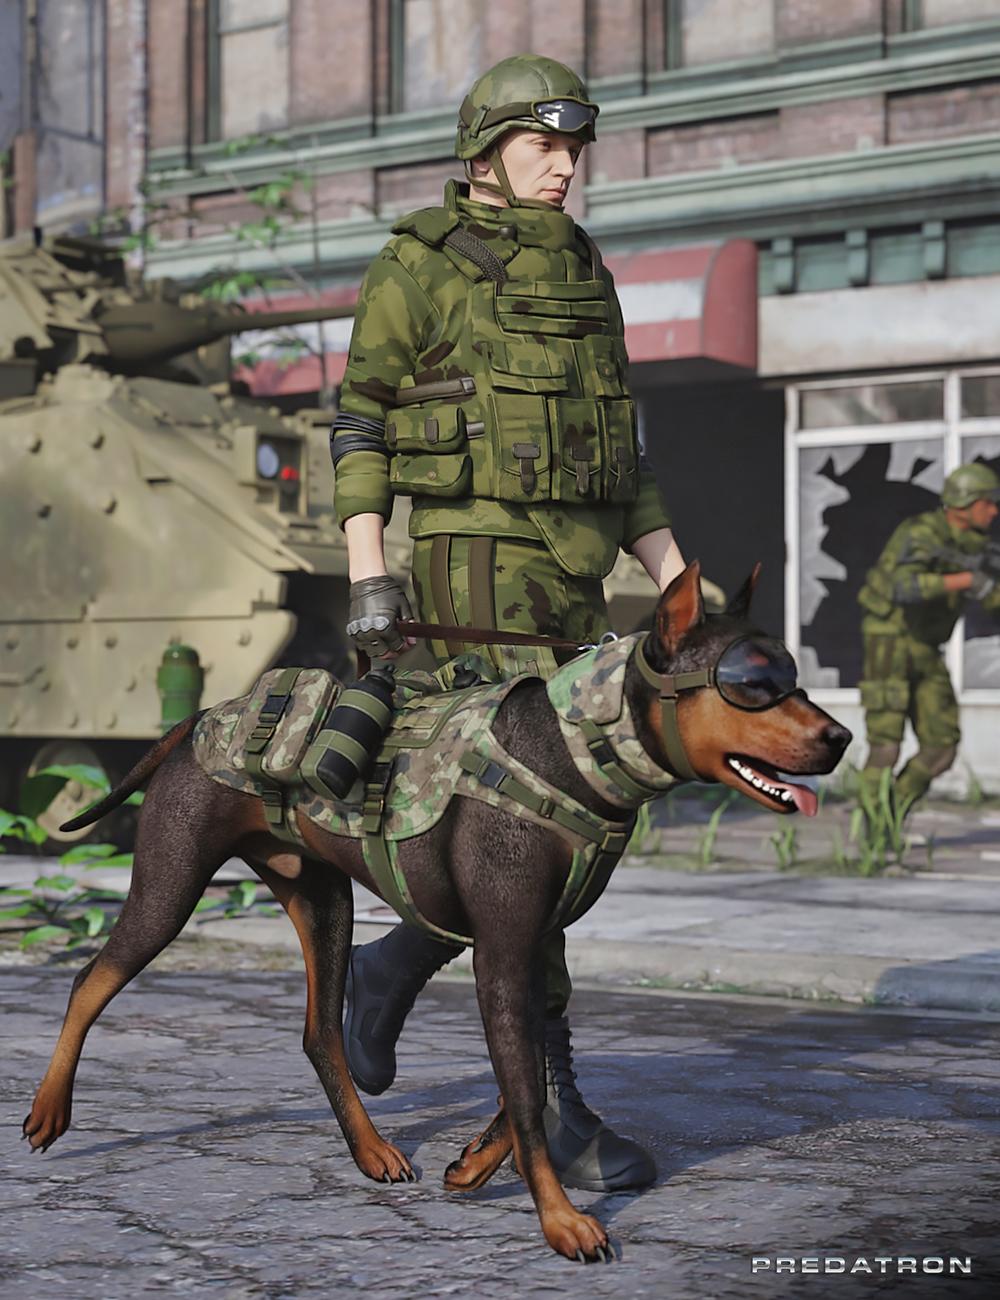 Utility Dog Vests for Daz Dog 8 by: Predatron, 3D Models by Daz 3D